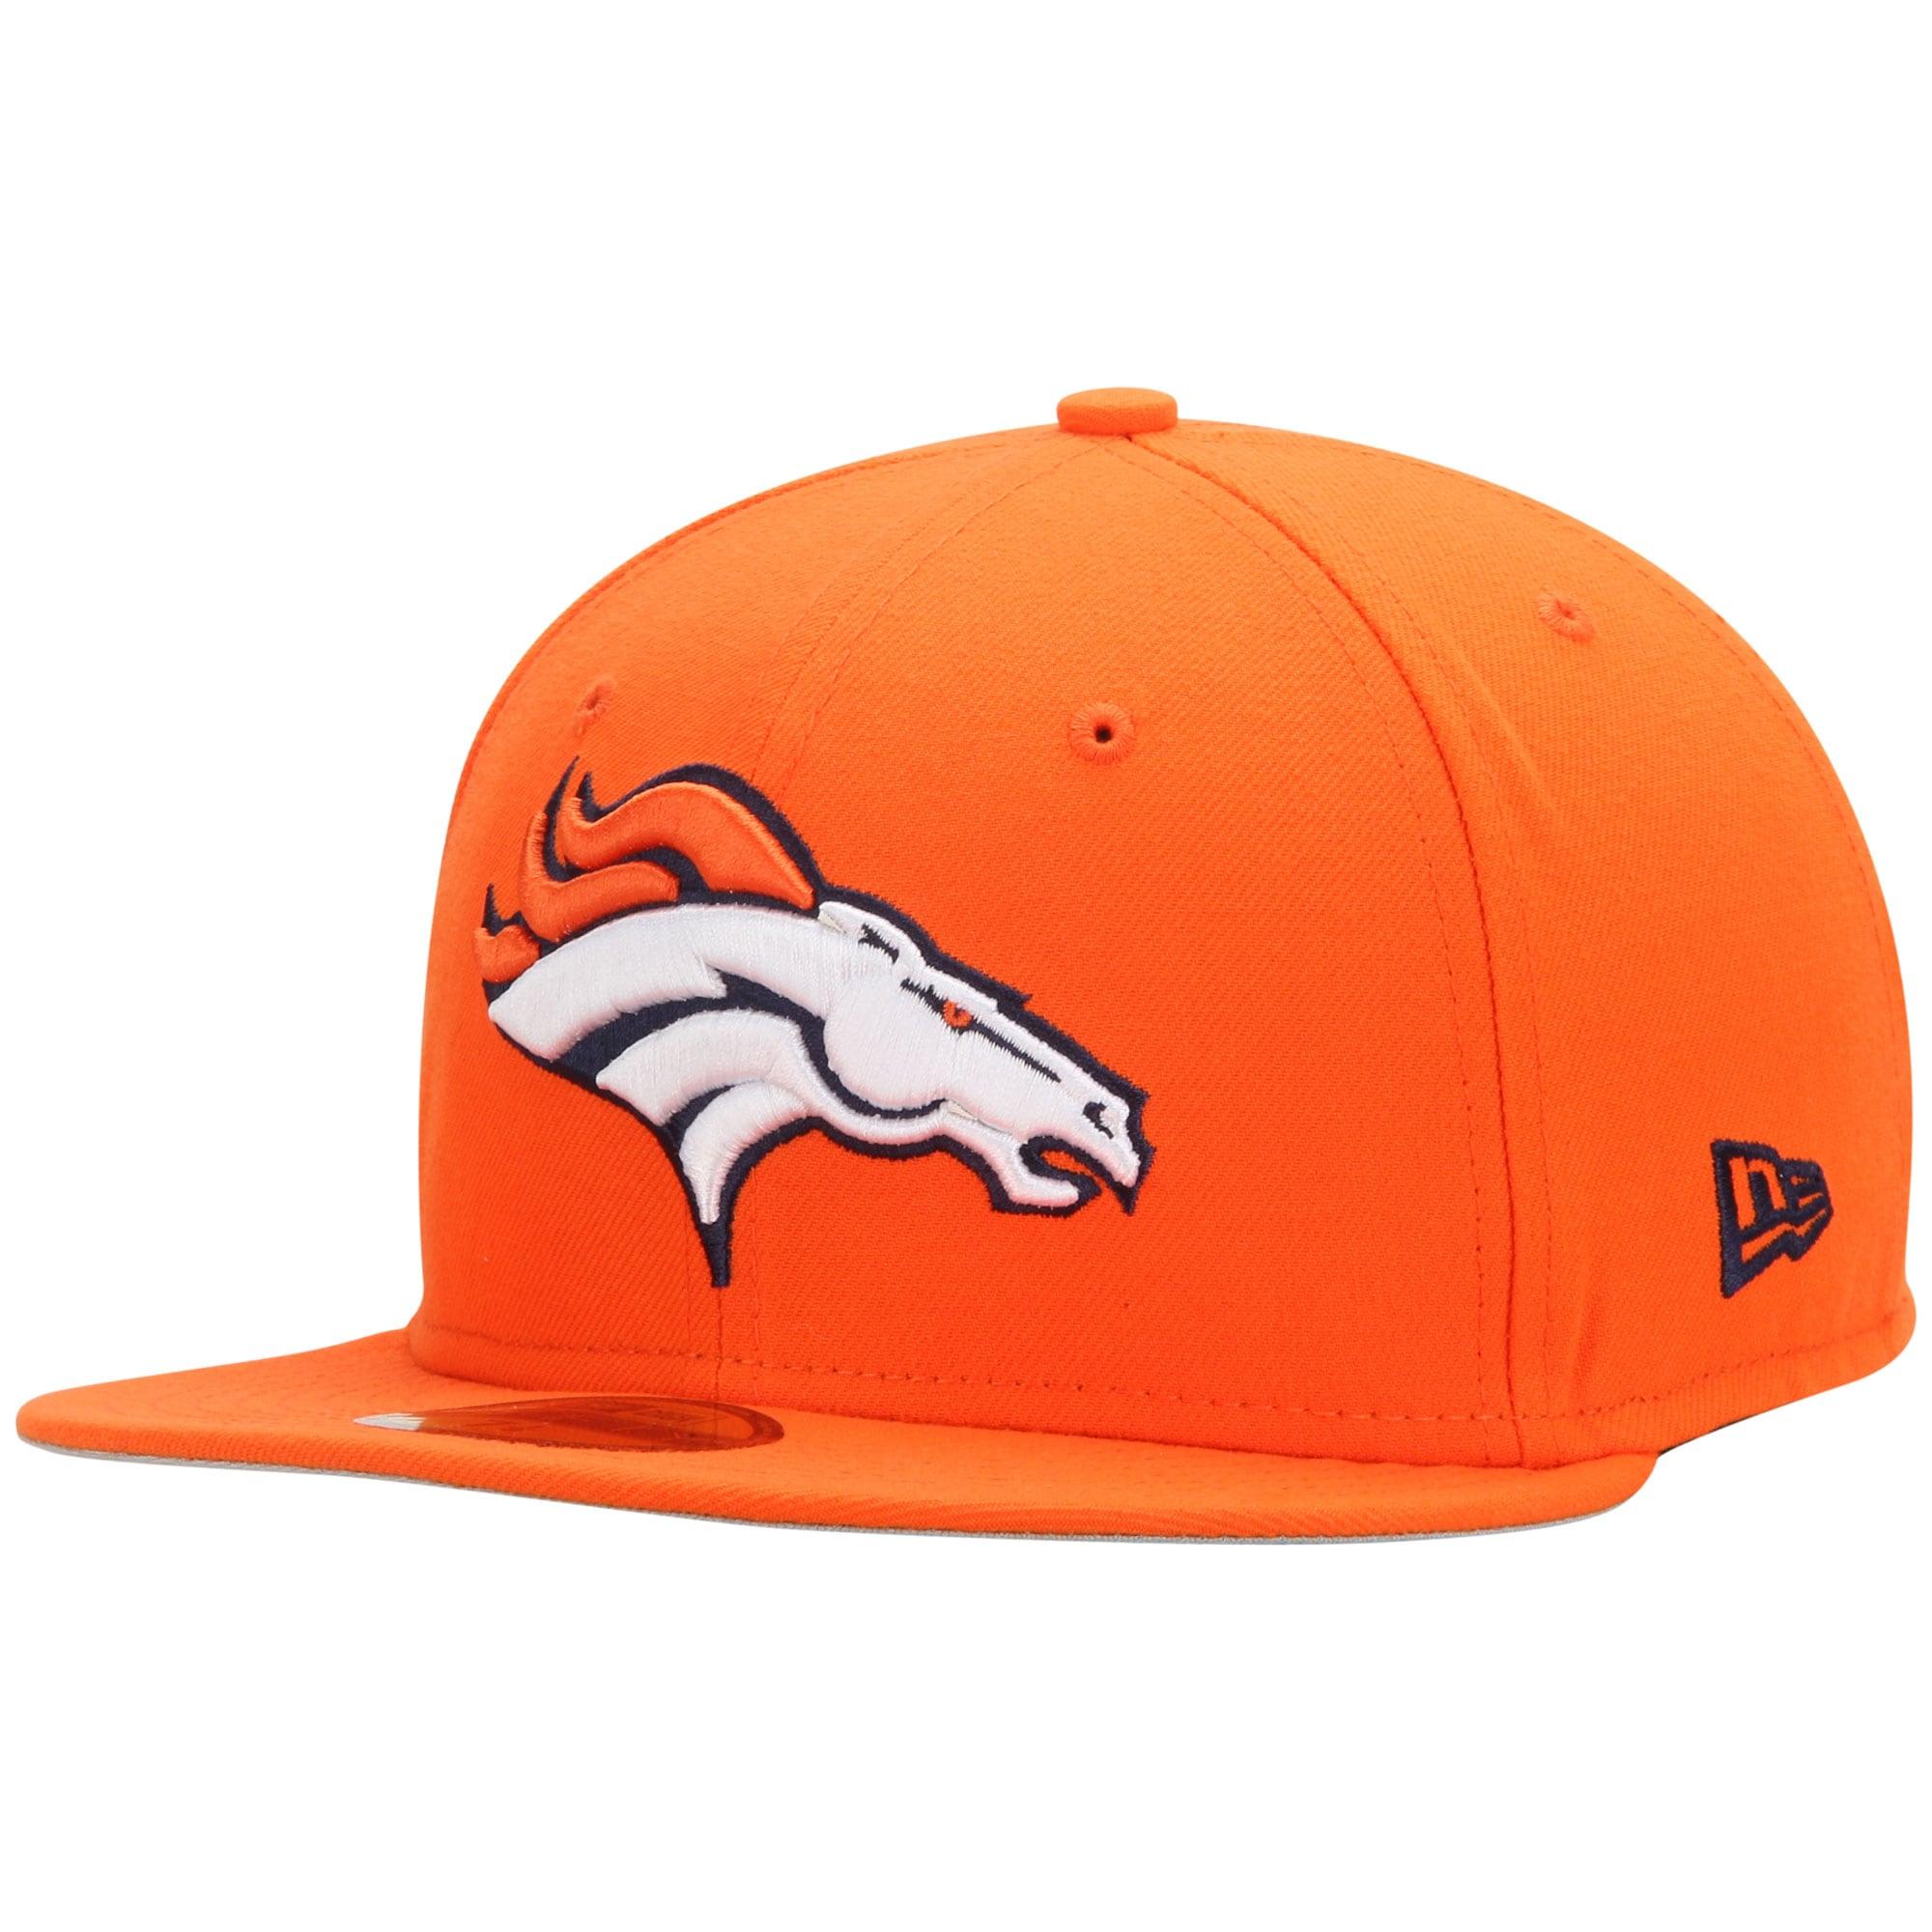 Denver Broncos New Era State Clip 59FIFTY Fitted Hat - Orange